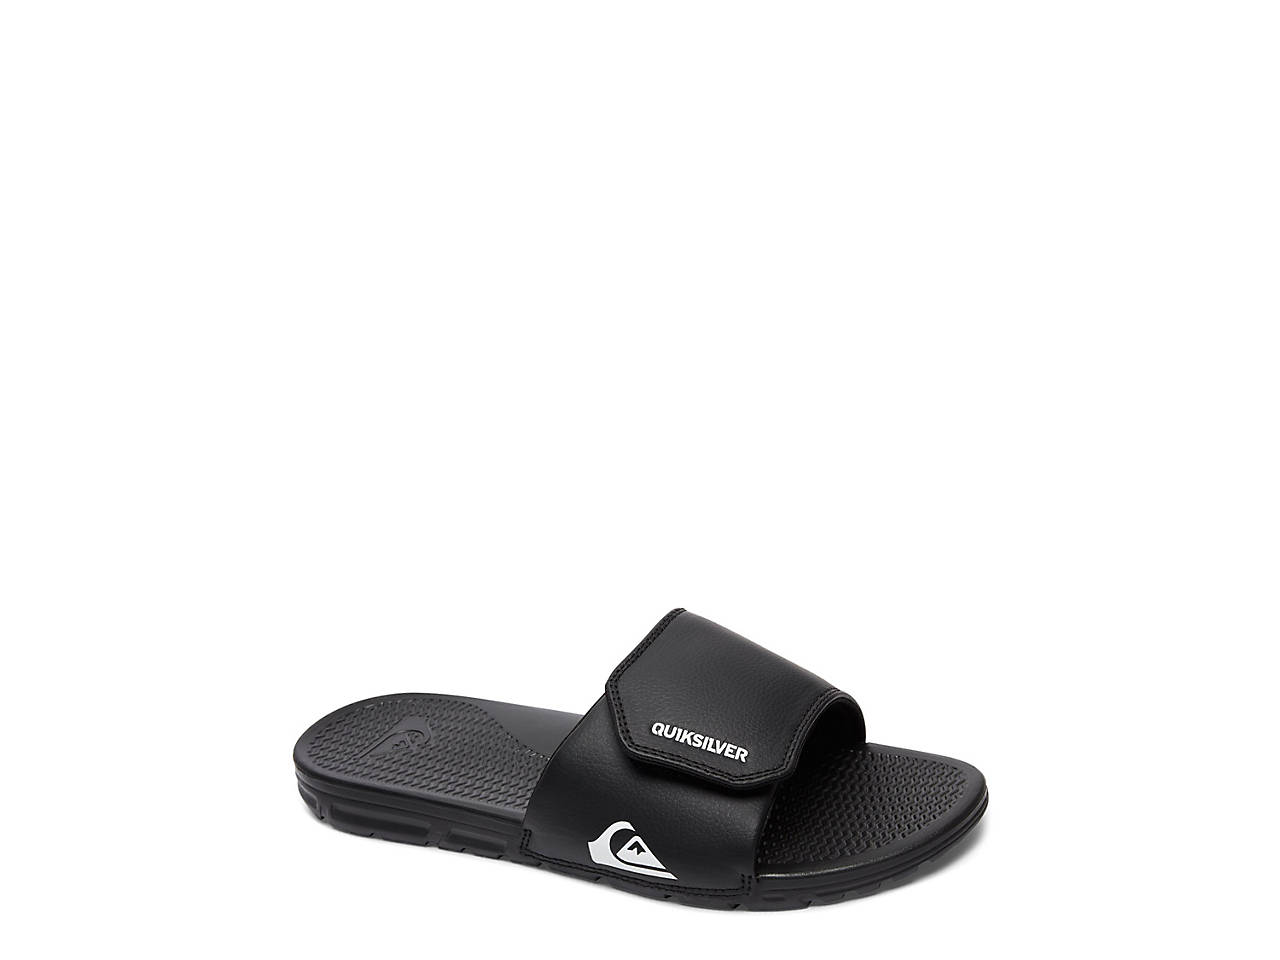 0fbc061a8fc Quiksilver Shoreline Adjust Toddler   Youth Slide Sandal Kids Shoes ...